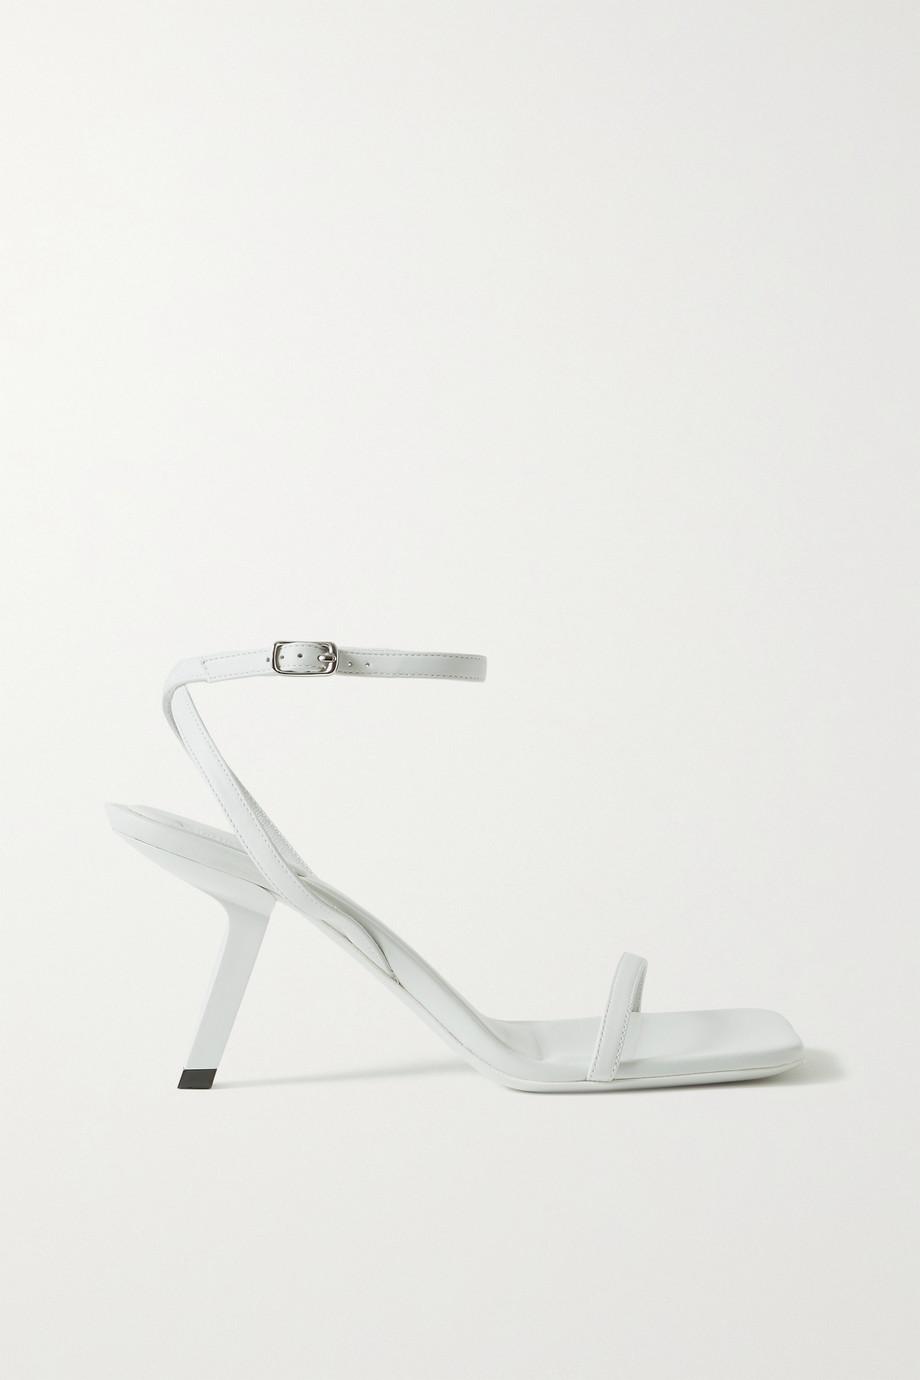 Balenciaga Void leather sandals